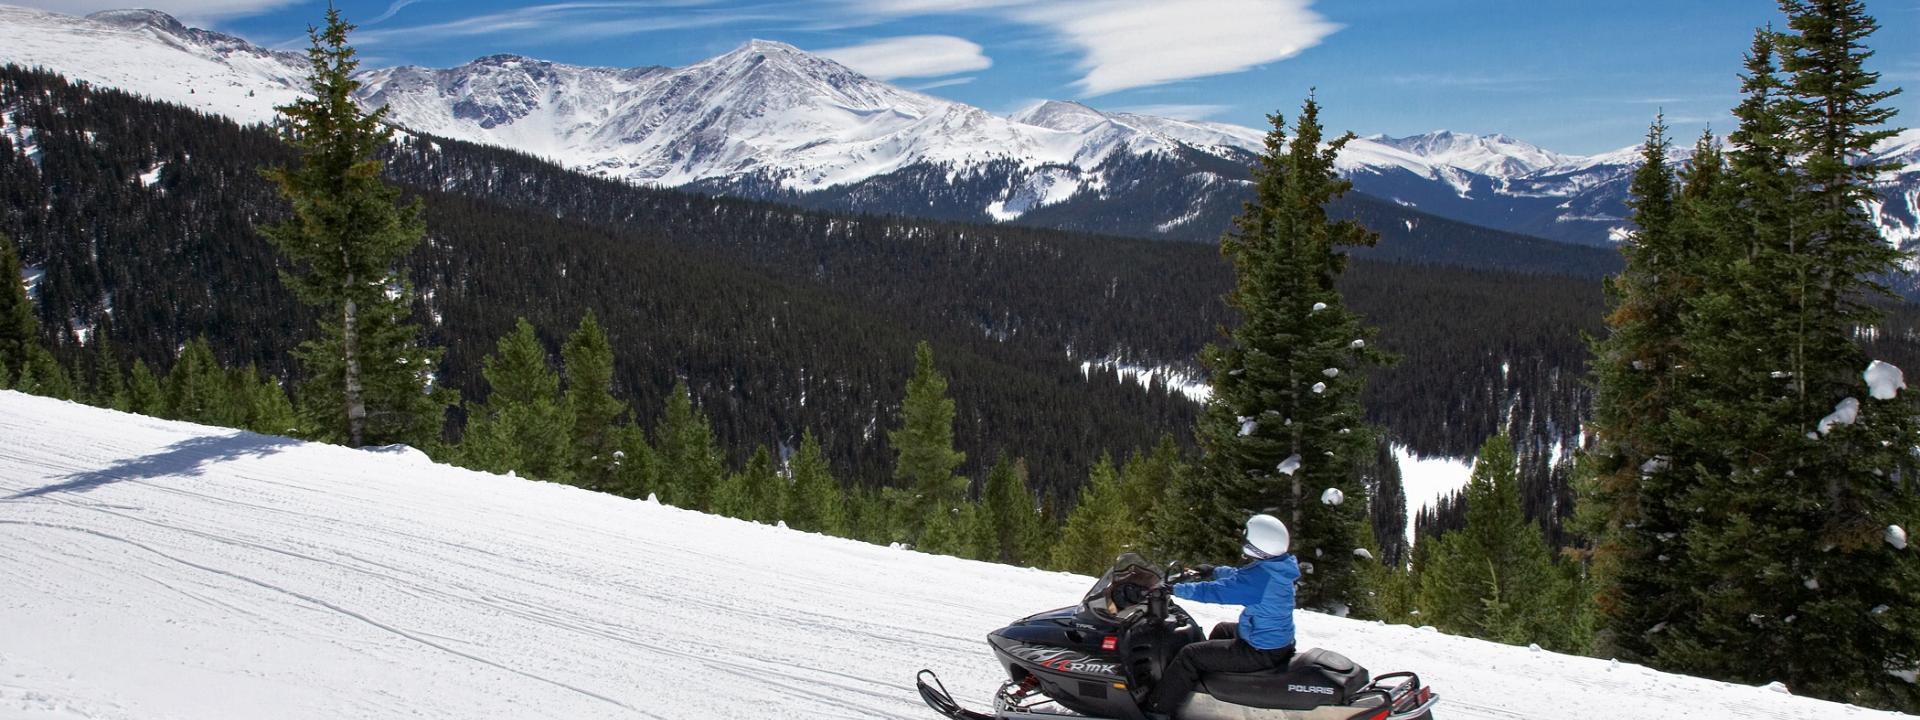 Snowmobile on the Continental Divide near Winter Park, Colorado